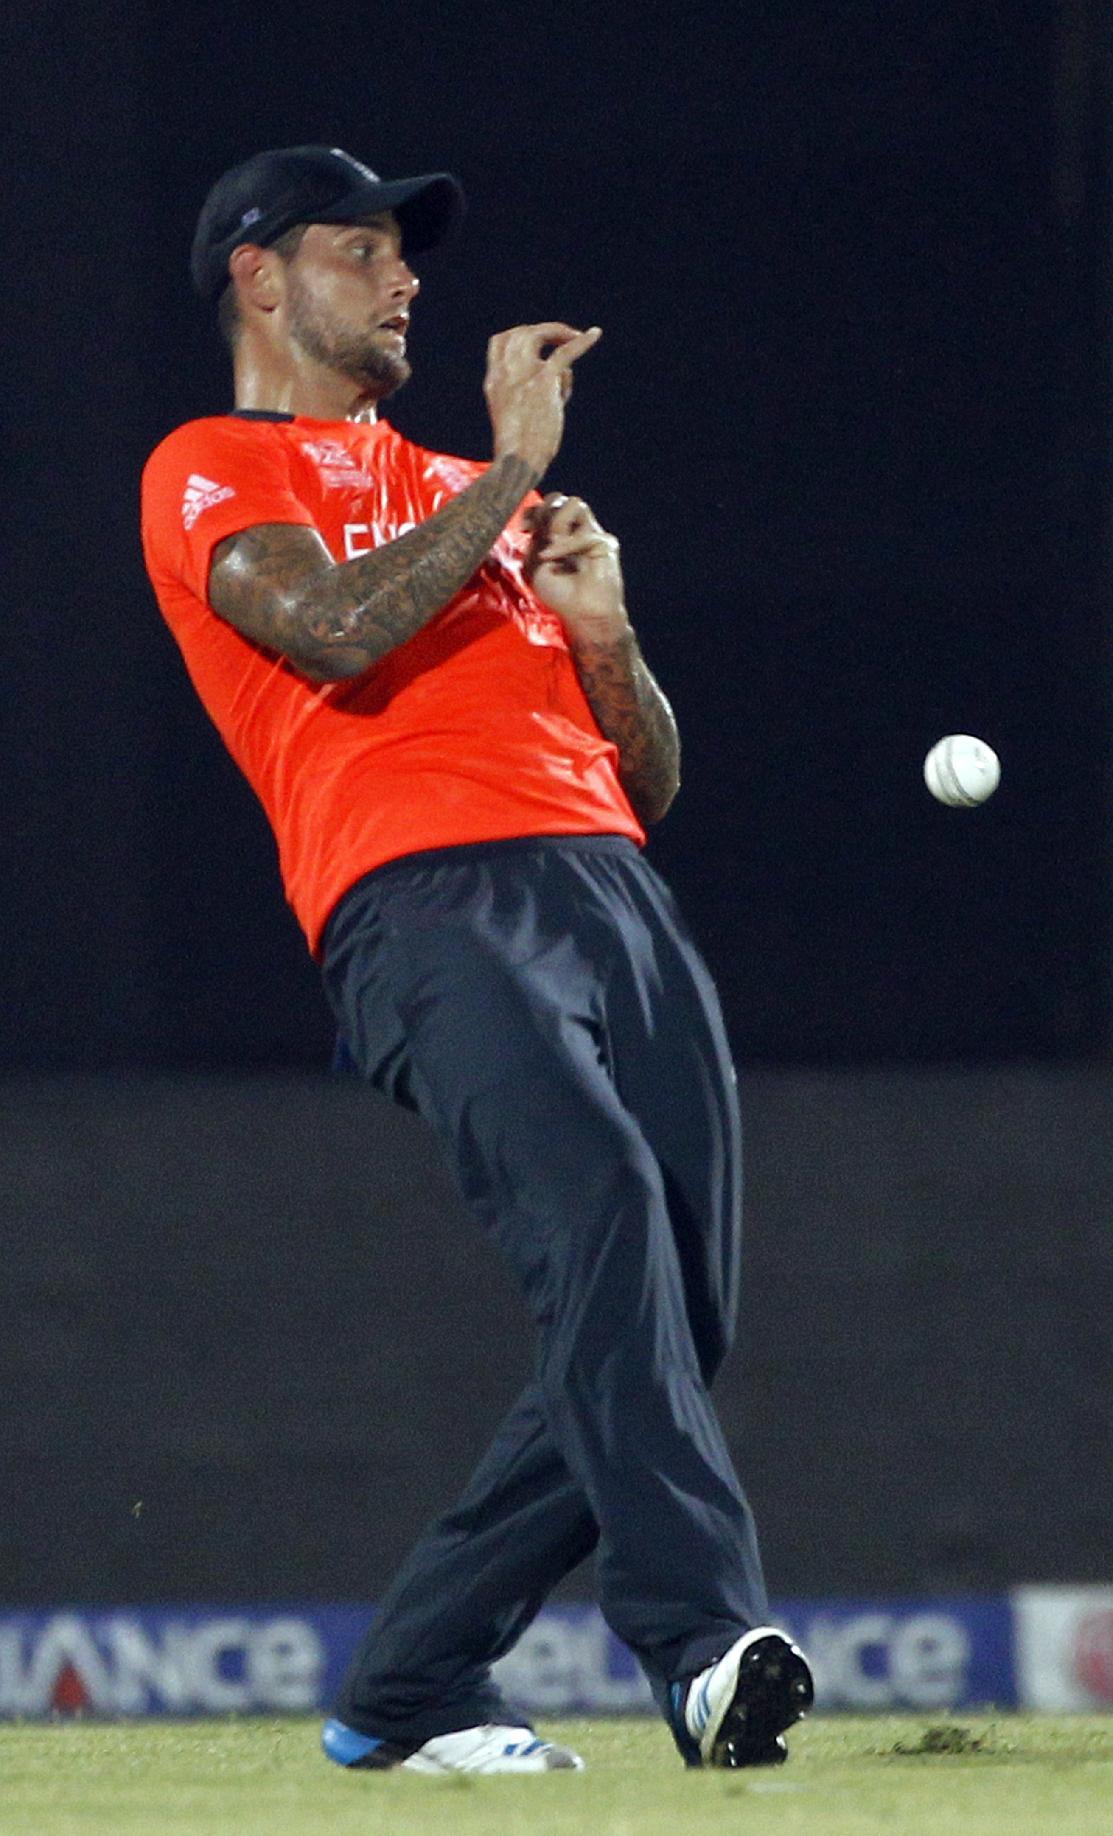 England's Jade Dernbach drops a ball off Sri Lankan cricketer Mahela Jayawardena's shot during their ICC Twenty20 Cricket World Cup match in Chittagong, Bangladesh, Thursday, March 27, 2014